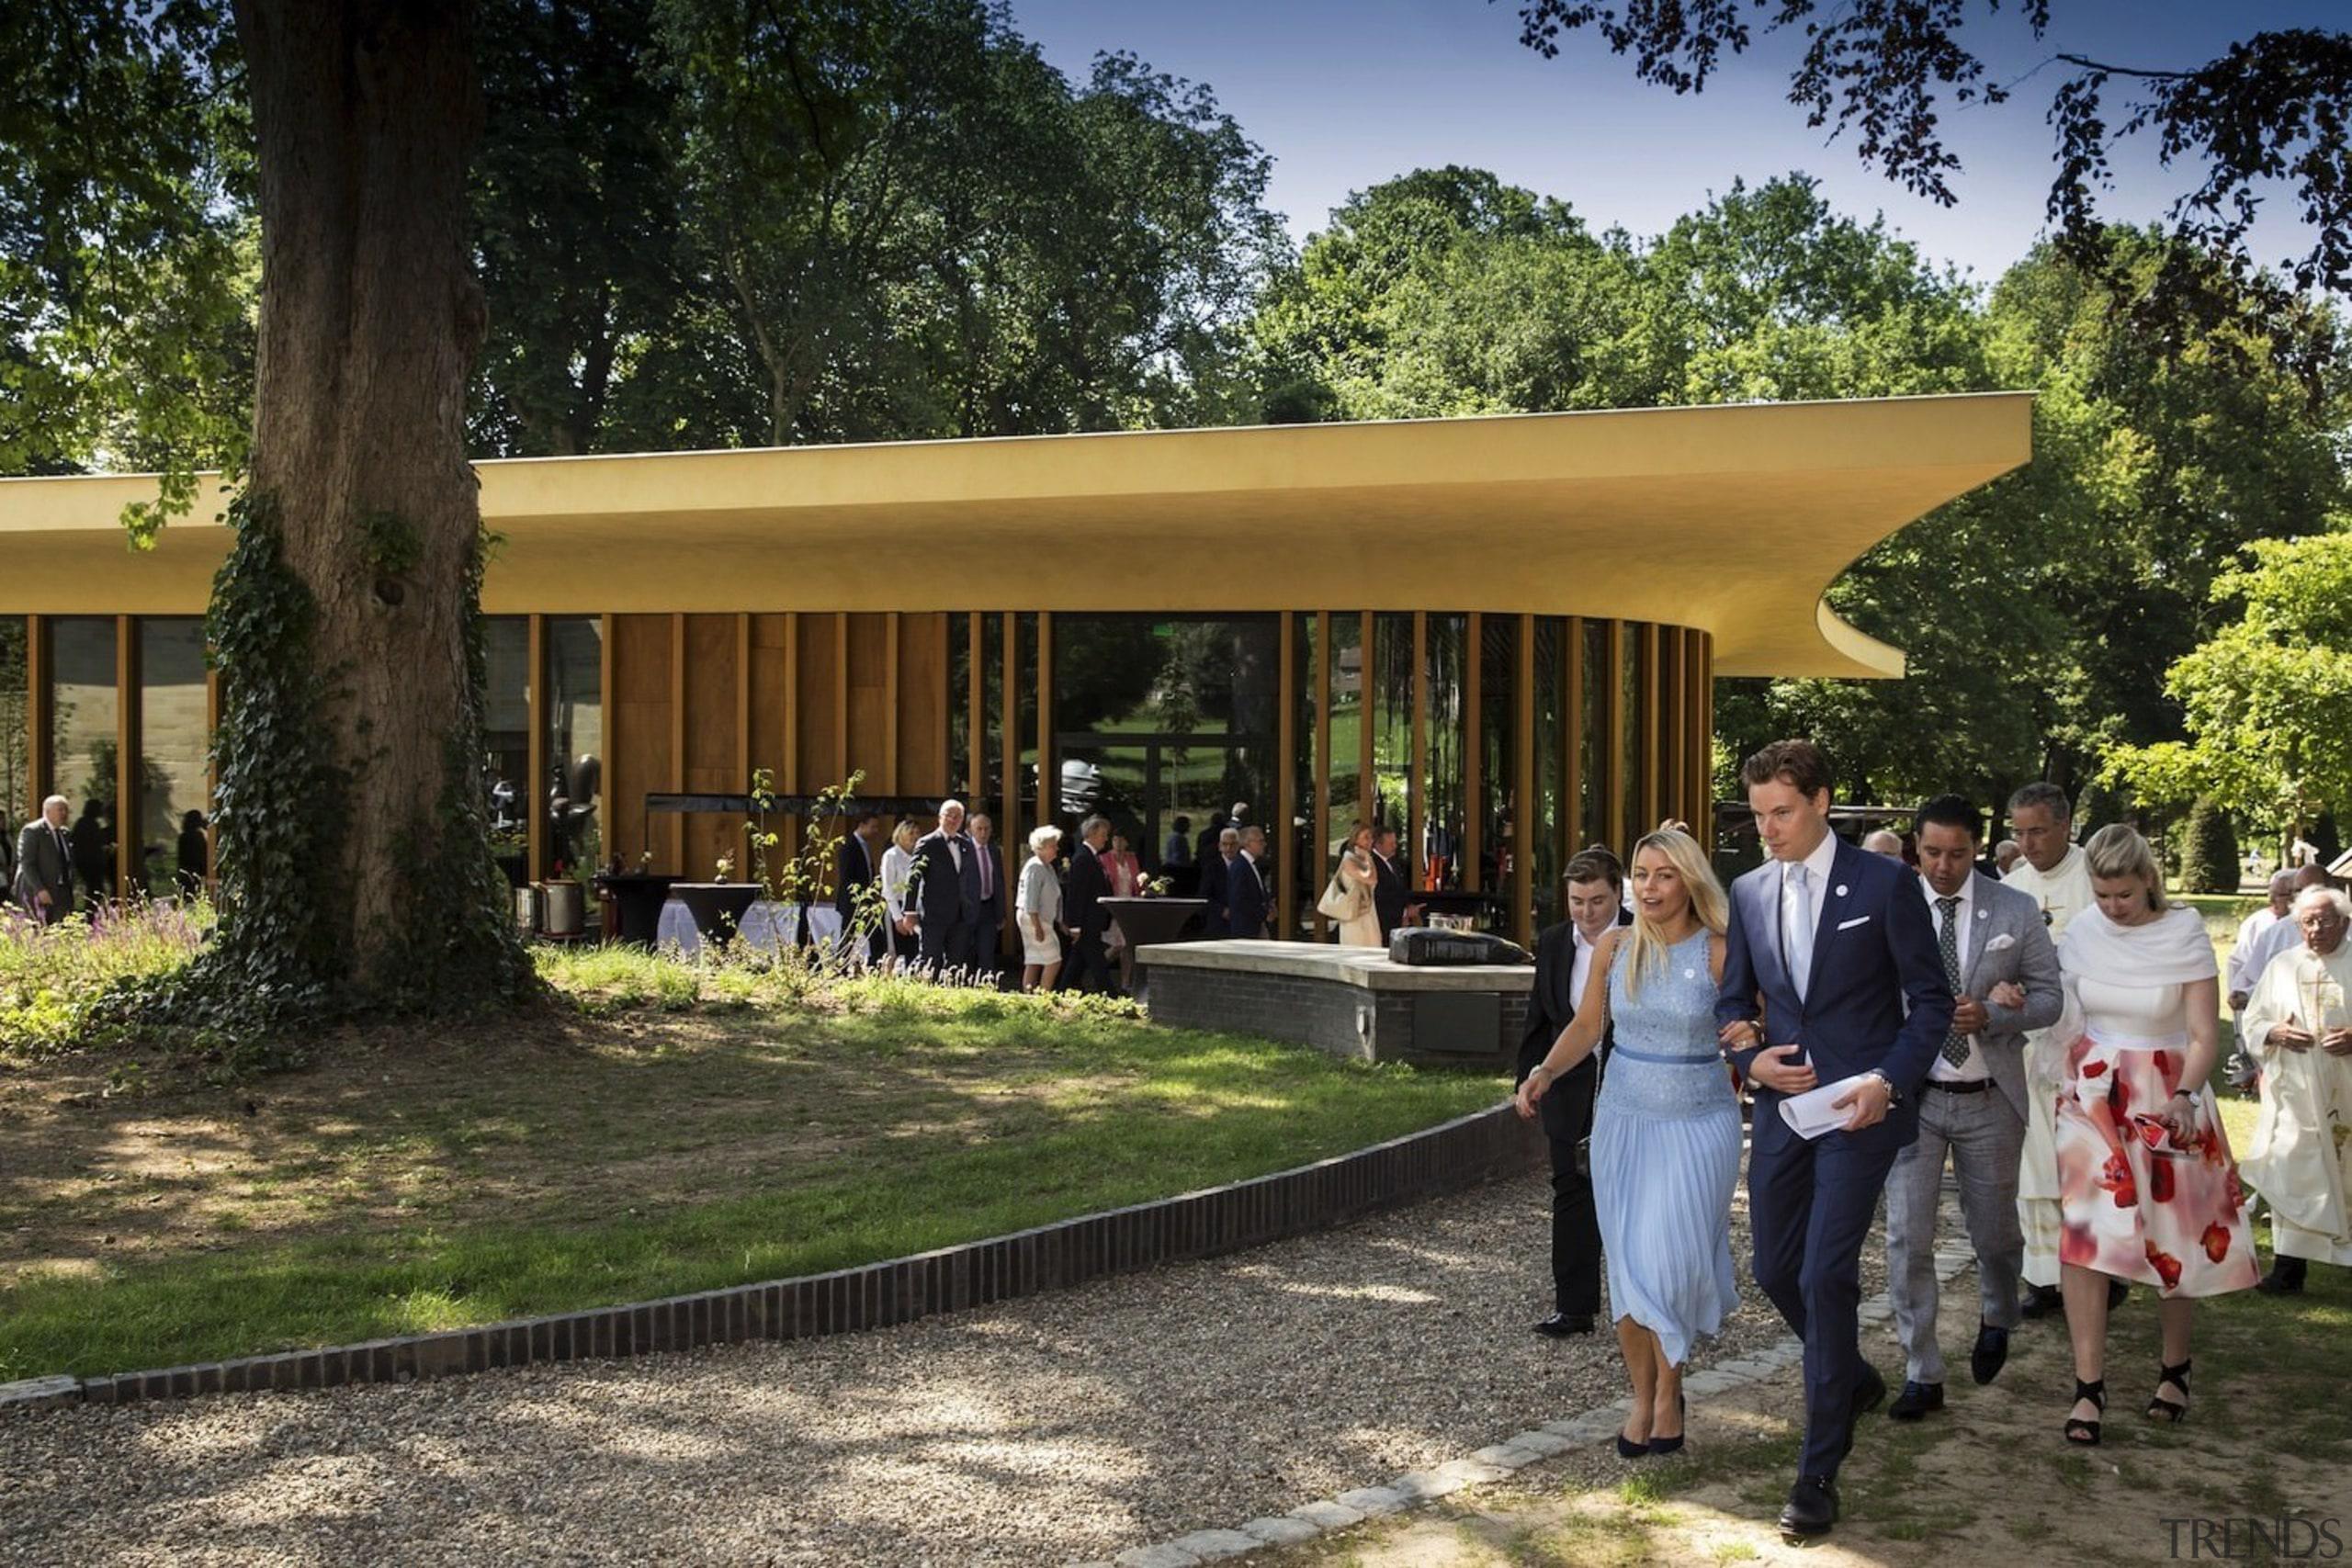 Architect: Meccanoo house, pavilion, tree, brown, black